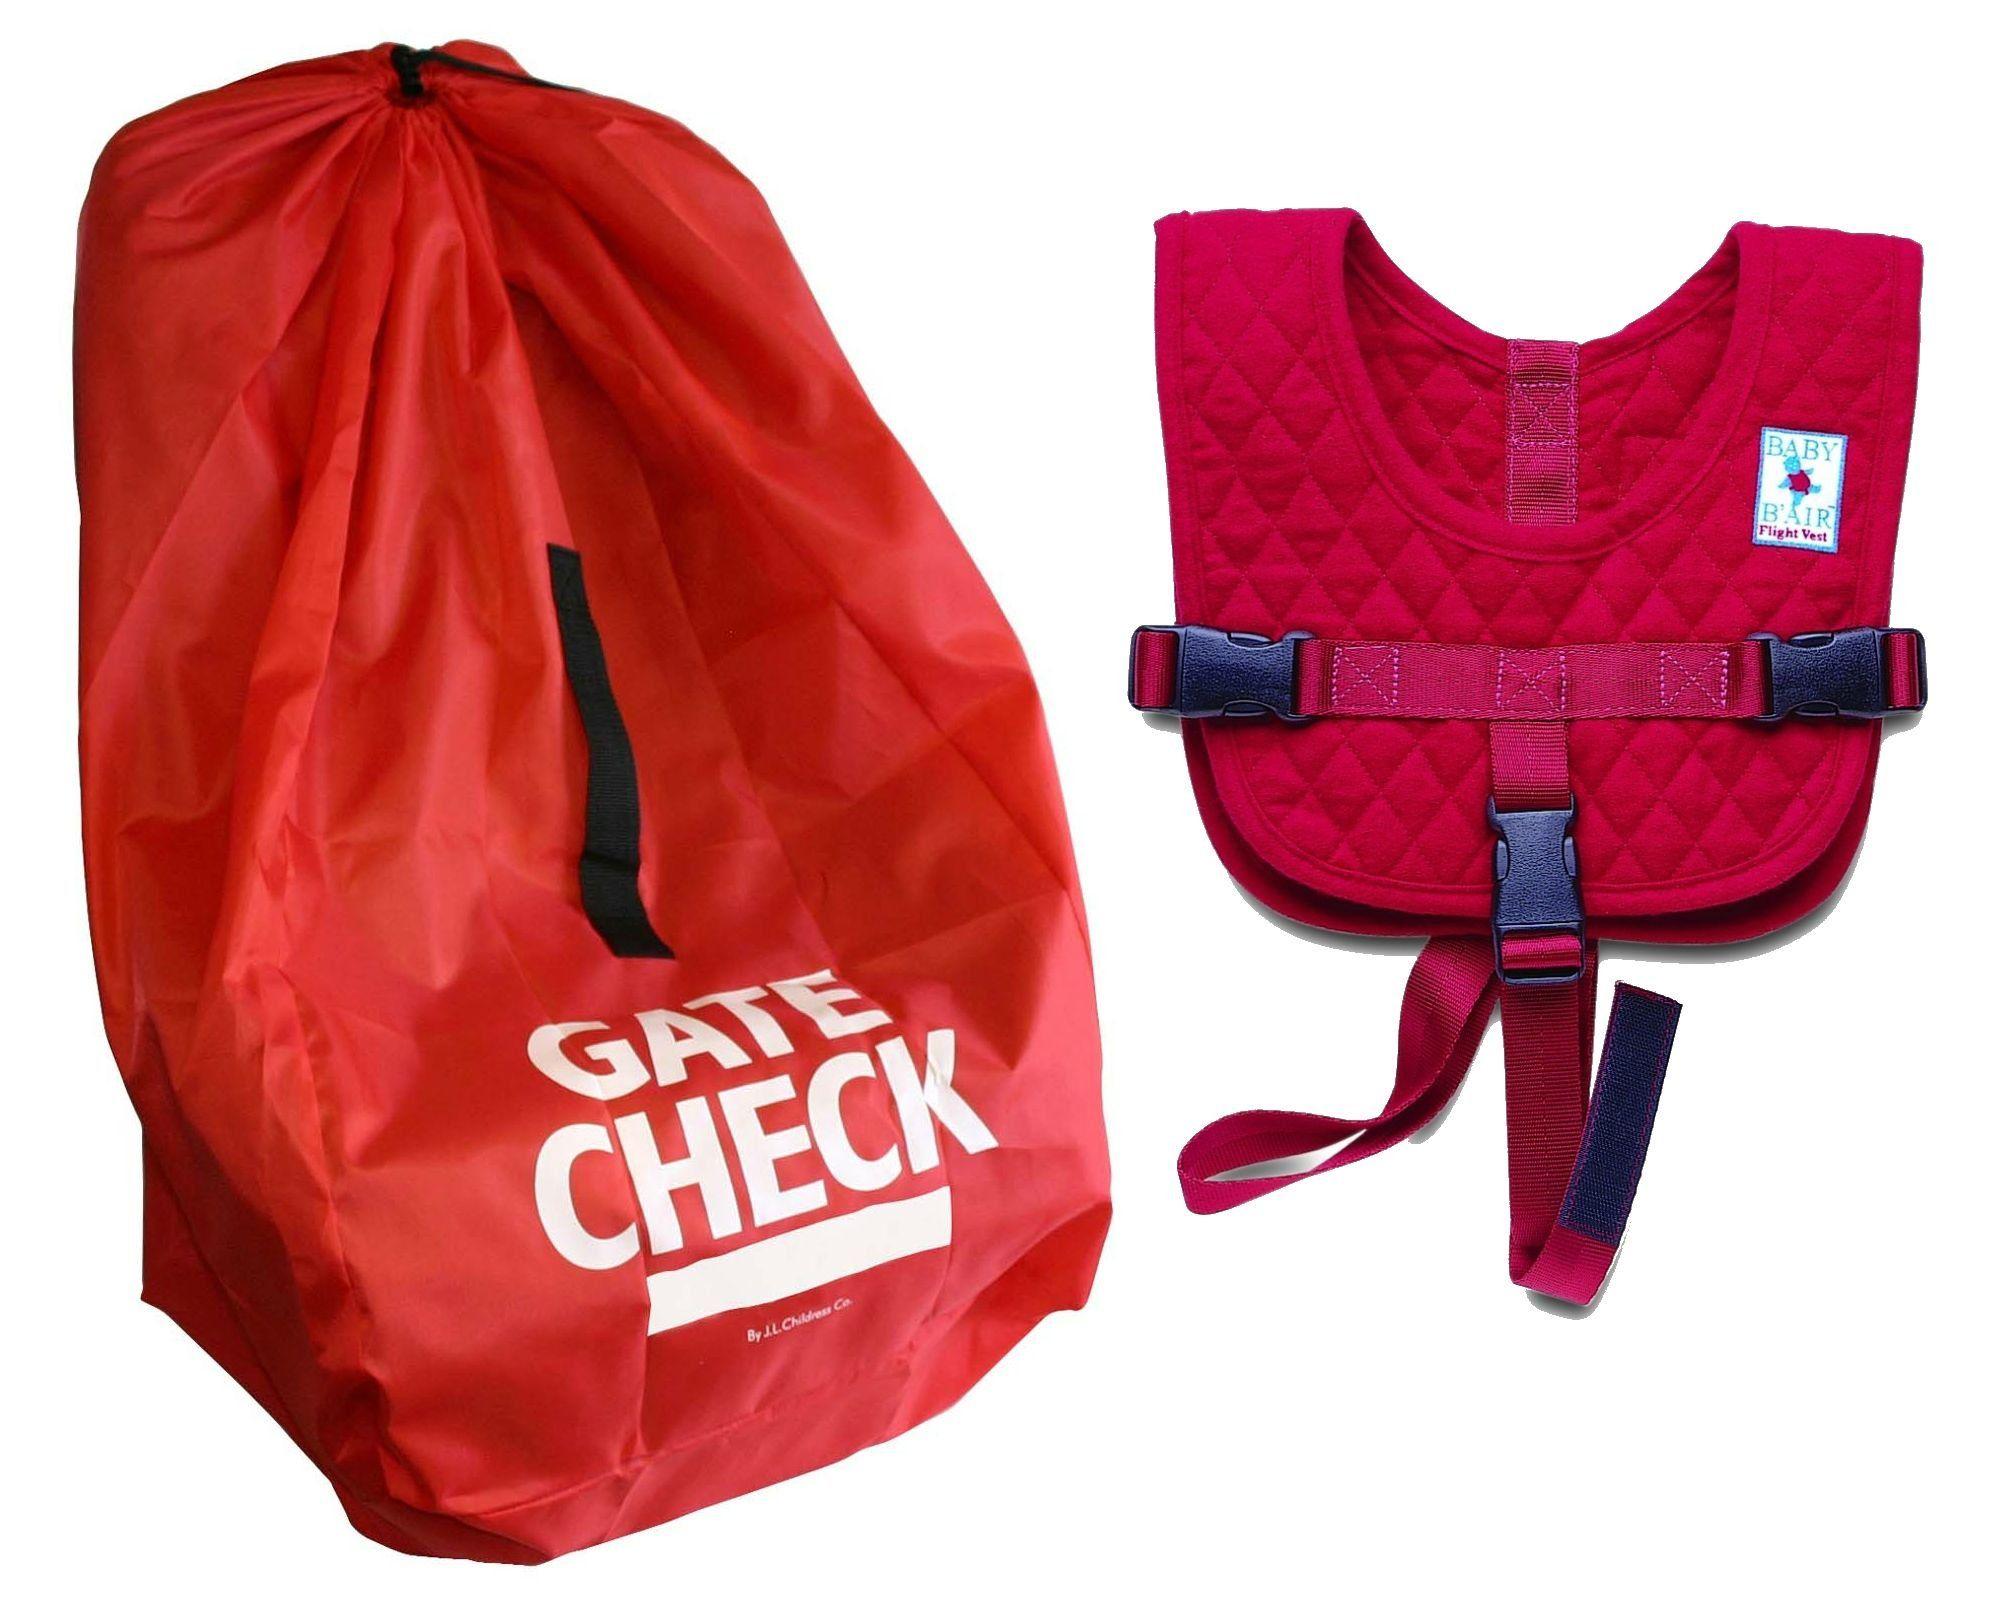 Baby BAir Infant Flight Vest With Gate Check Car Seat Bag Toddler Travel